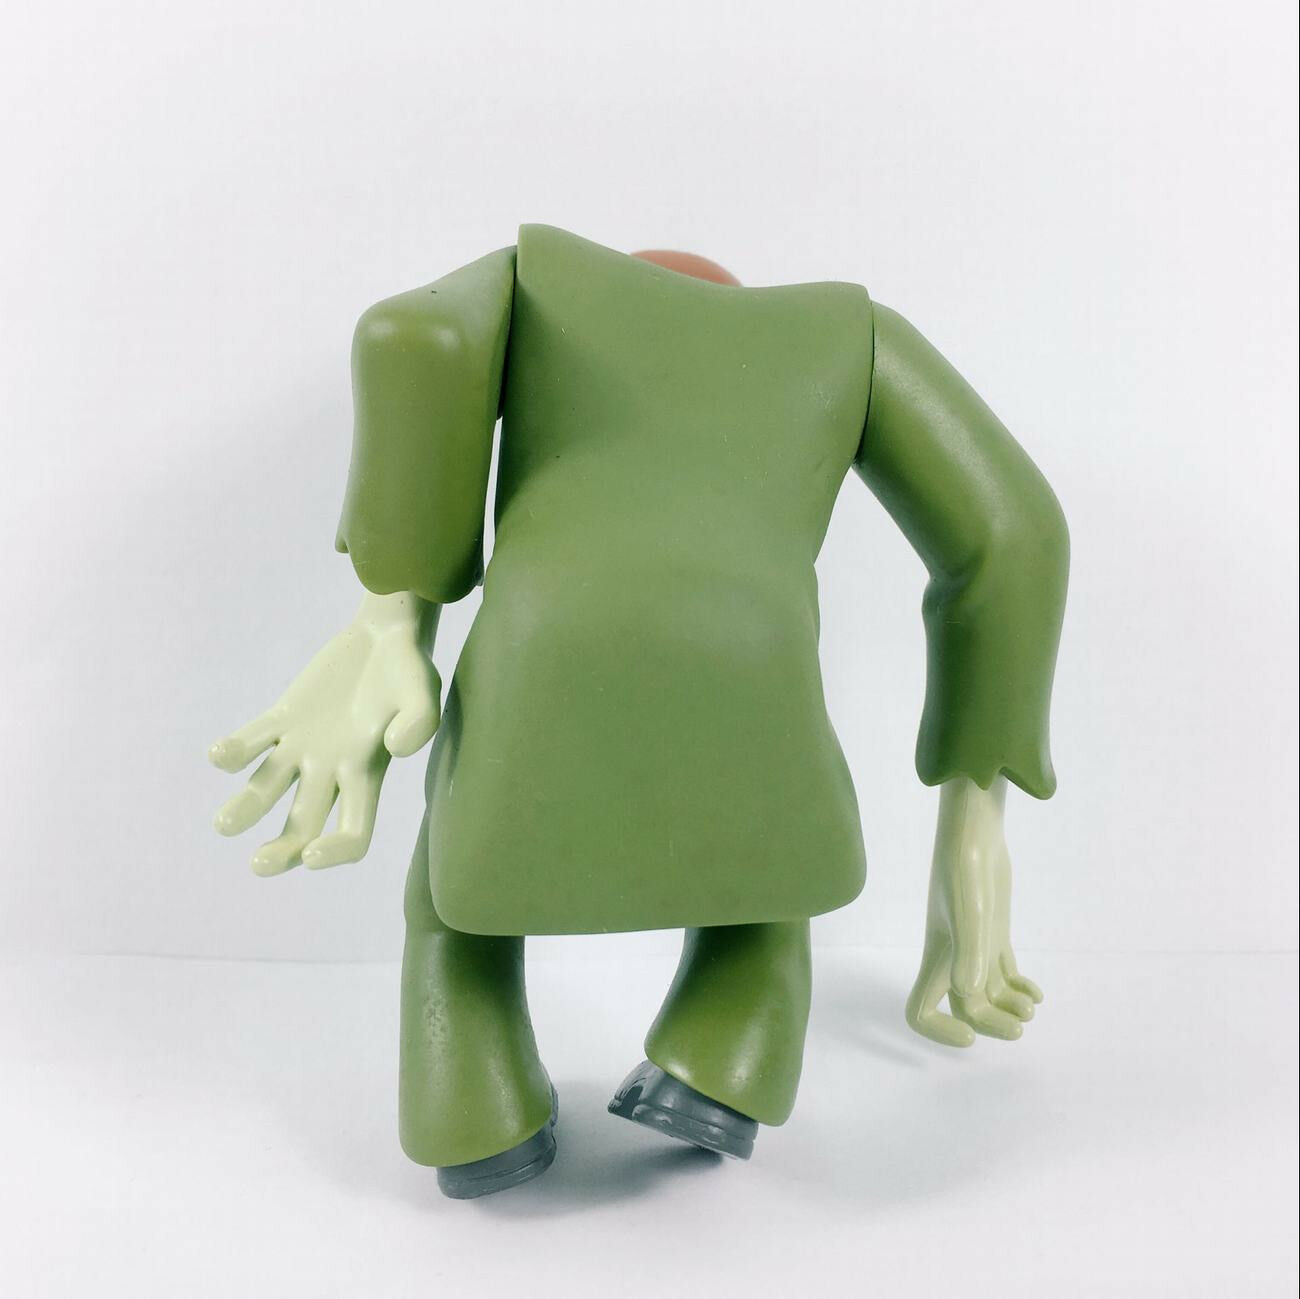 Lot 2PCS Scooby Doo Frankensteion /& Green Creeper Classic Figure toy kid gift